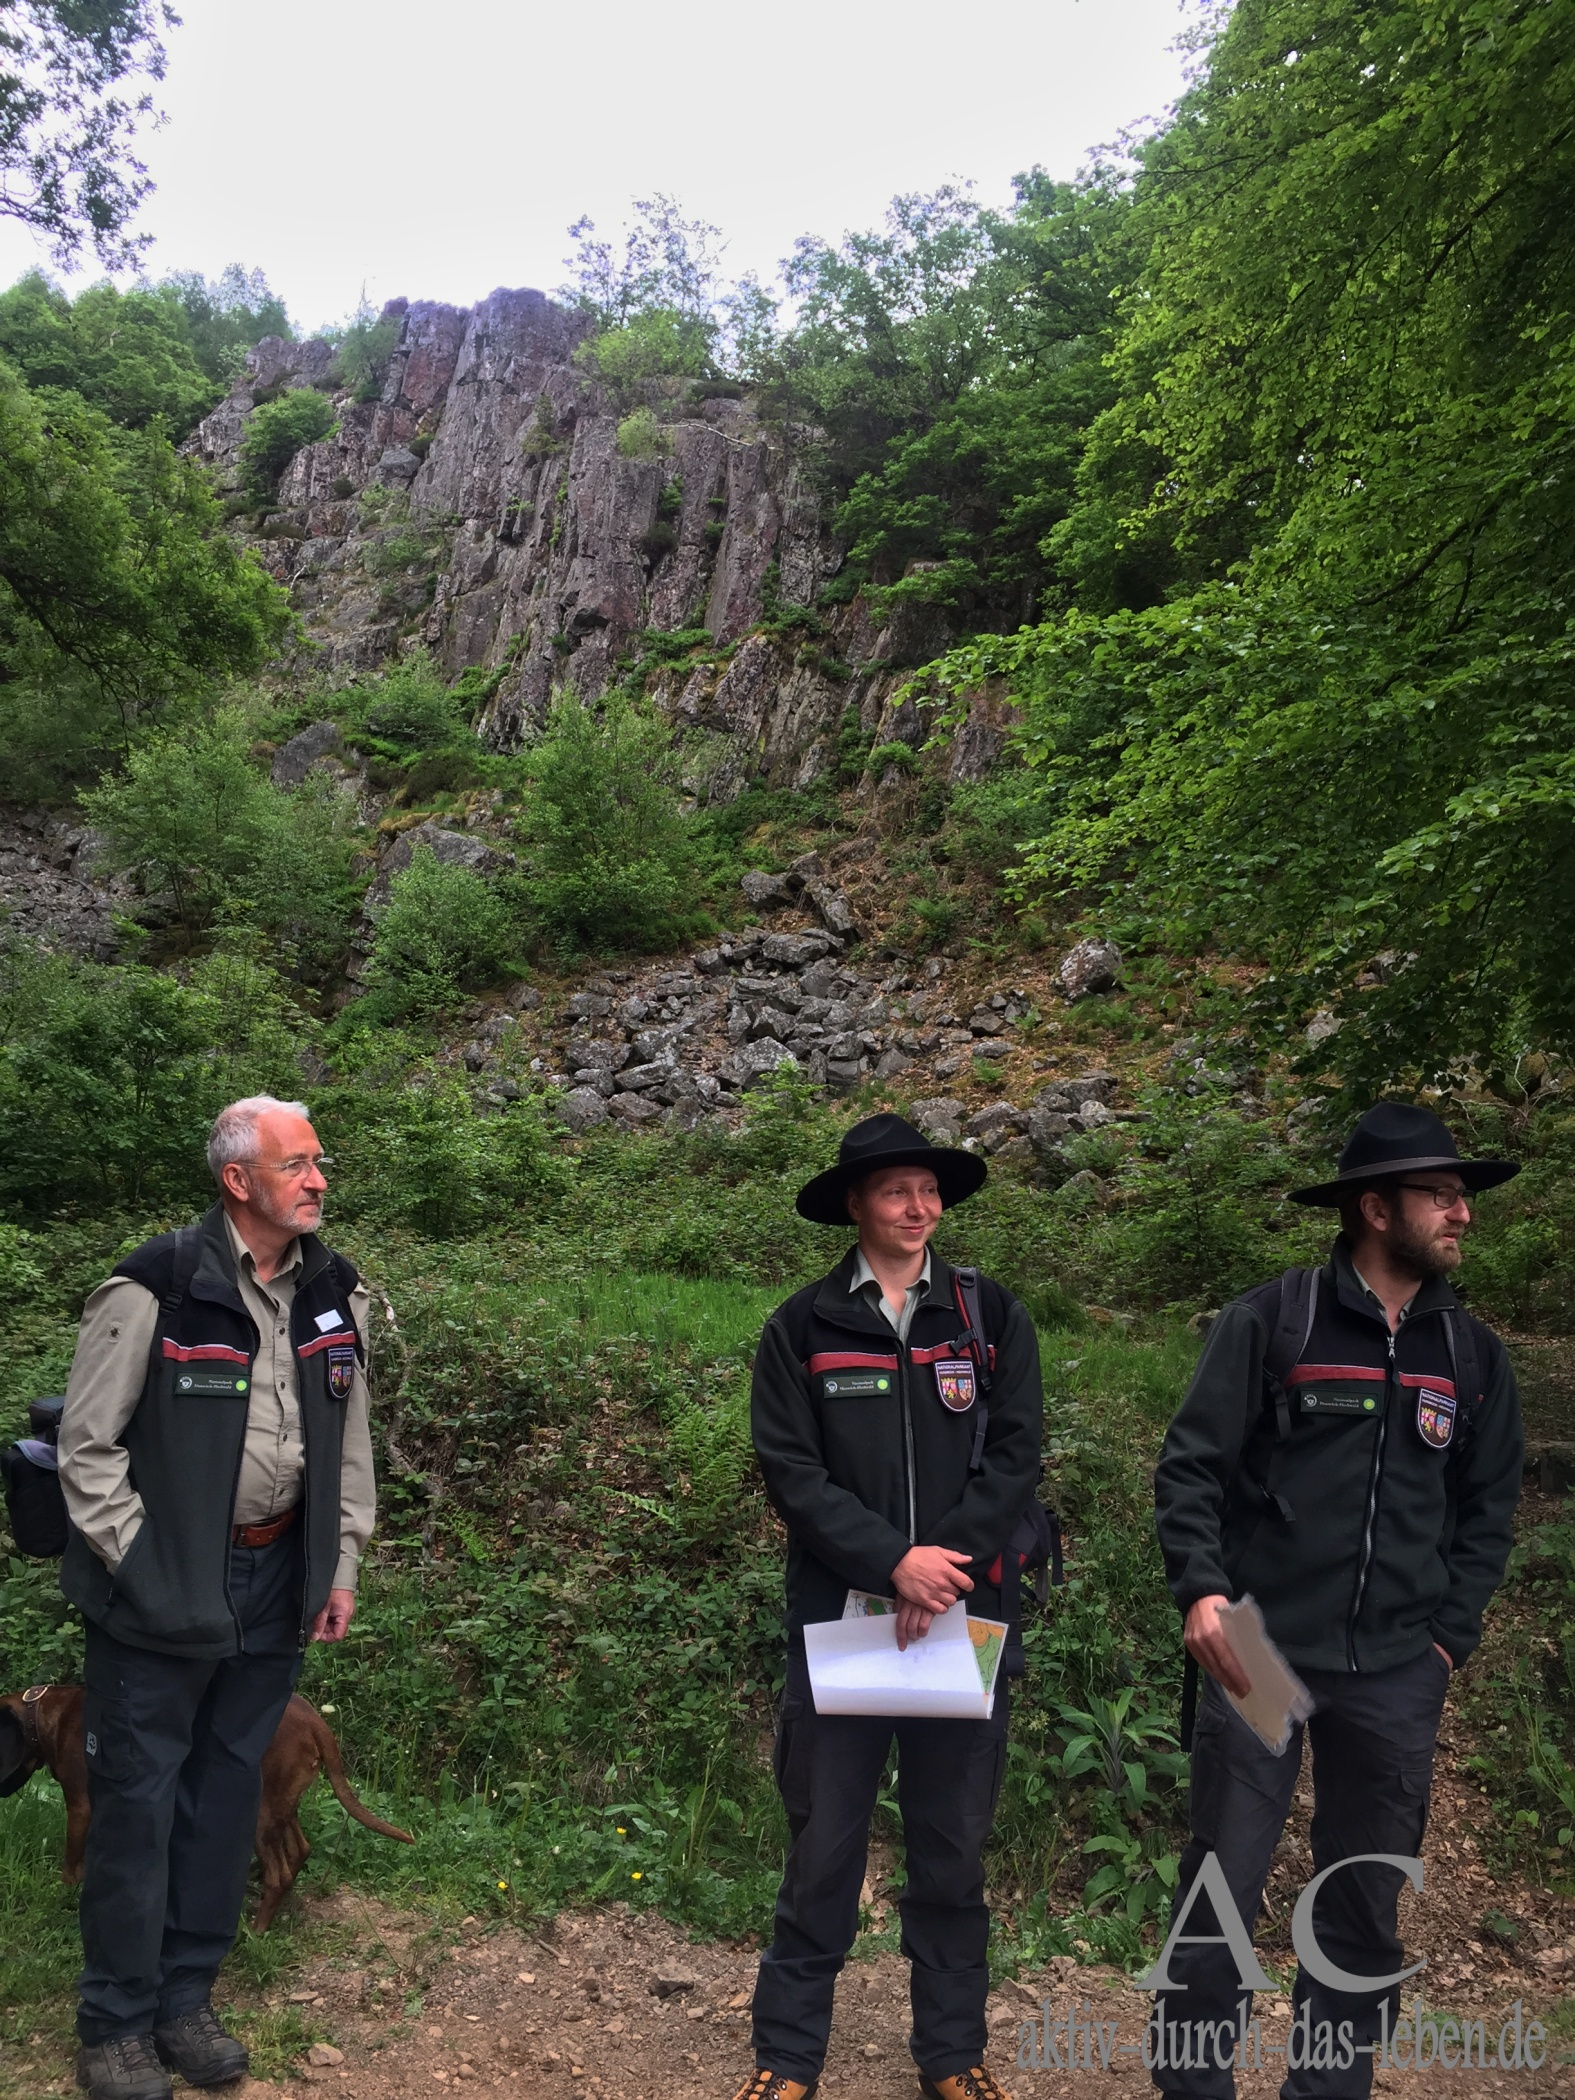 Fotograf Konrad Funk. Ranger Patric Heintz und Gabriel Wern